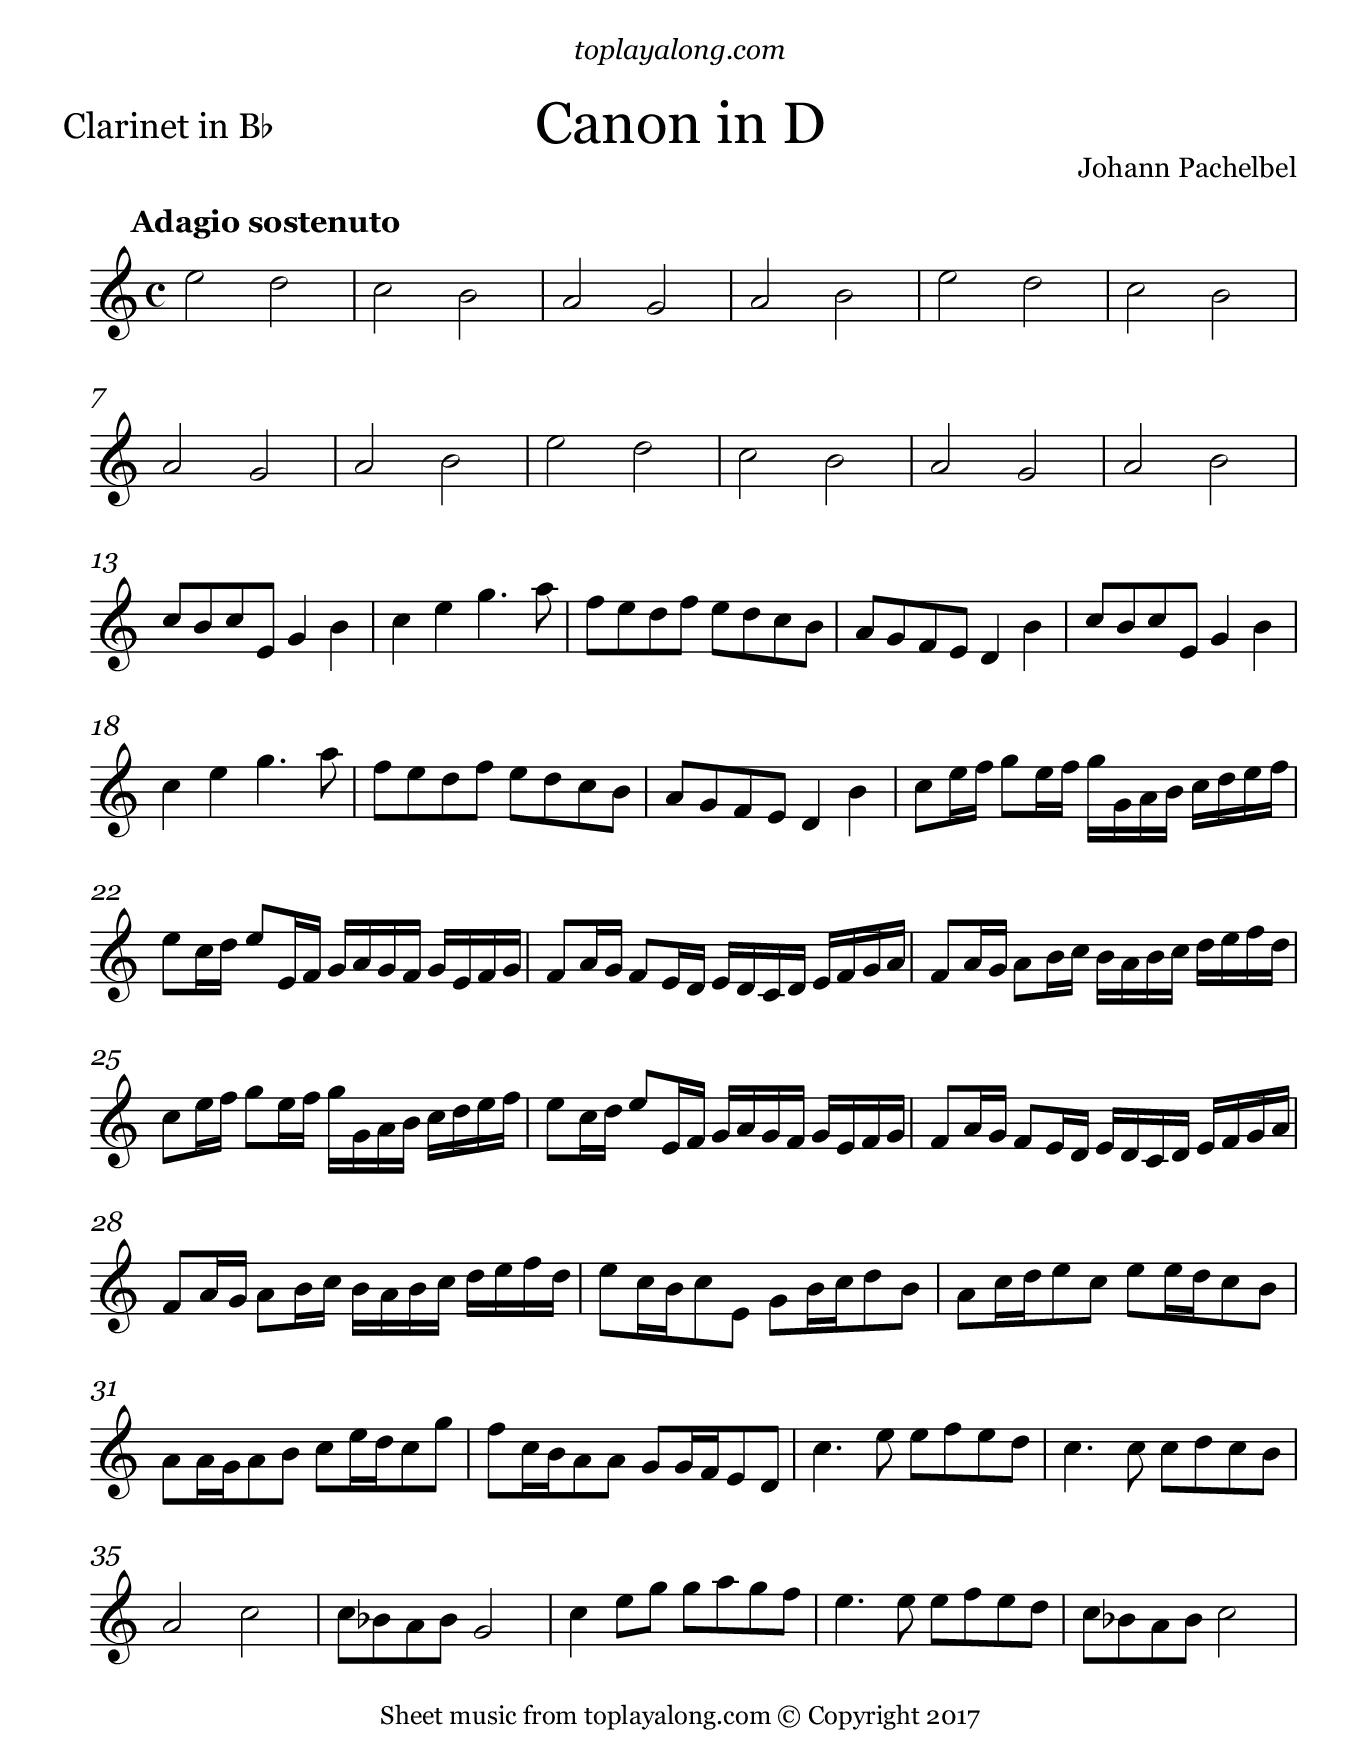 Pachelbel - Canon In D | Cleranet | Pinterest | Clarinet Sheet Music - Free Printable Clarinet Sheet Music